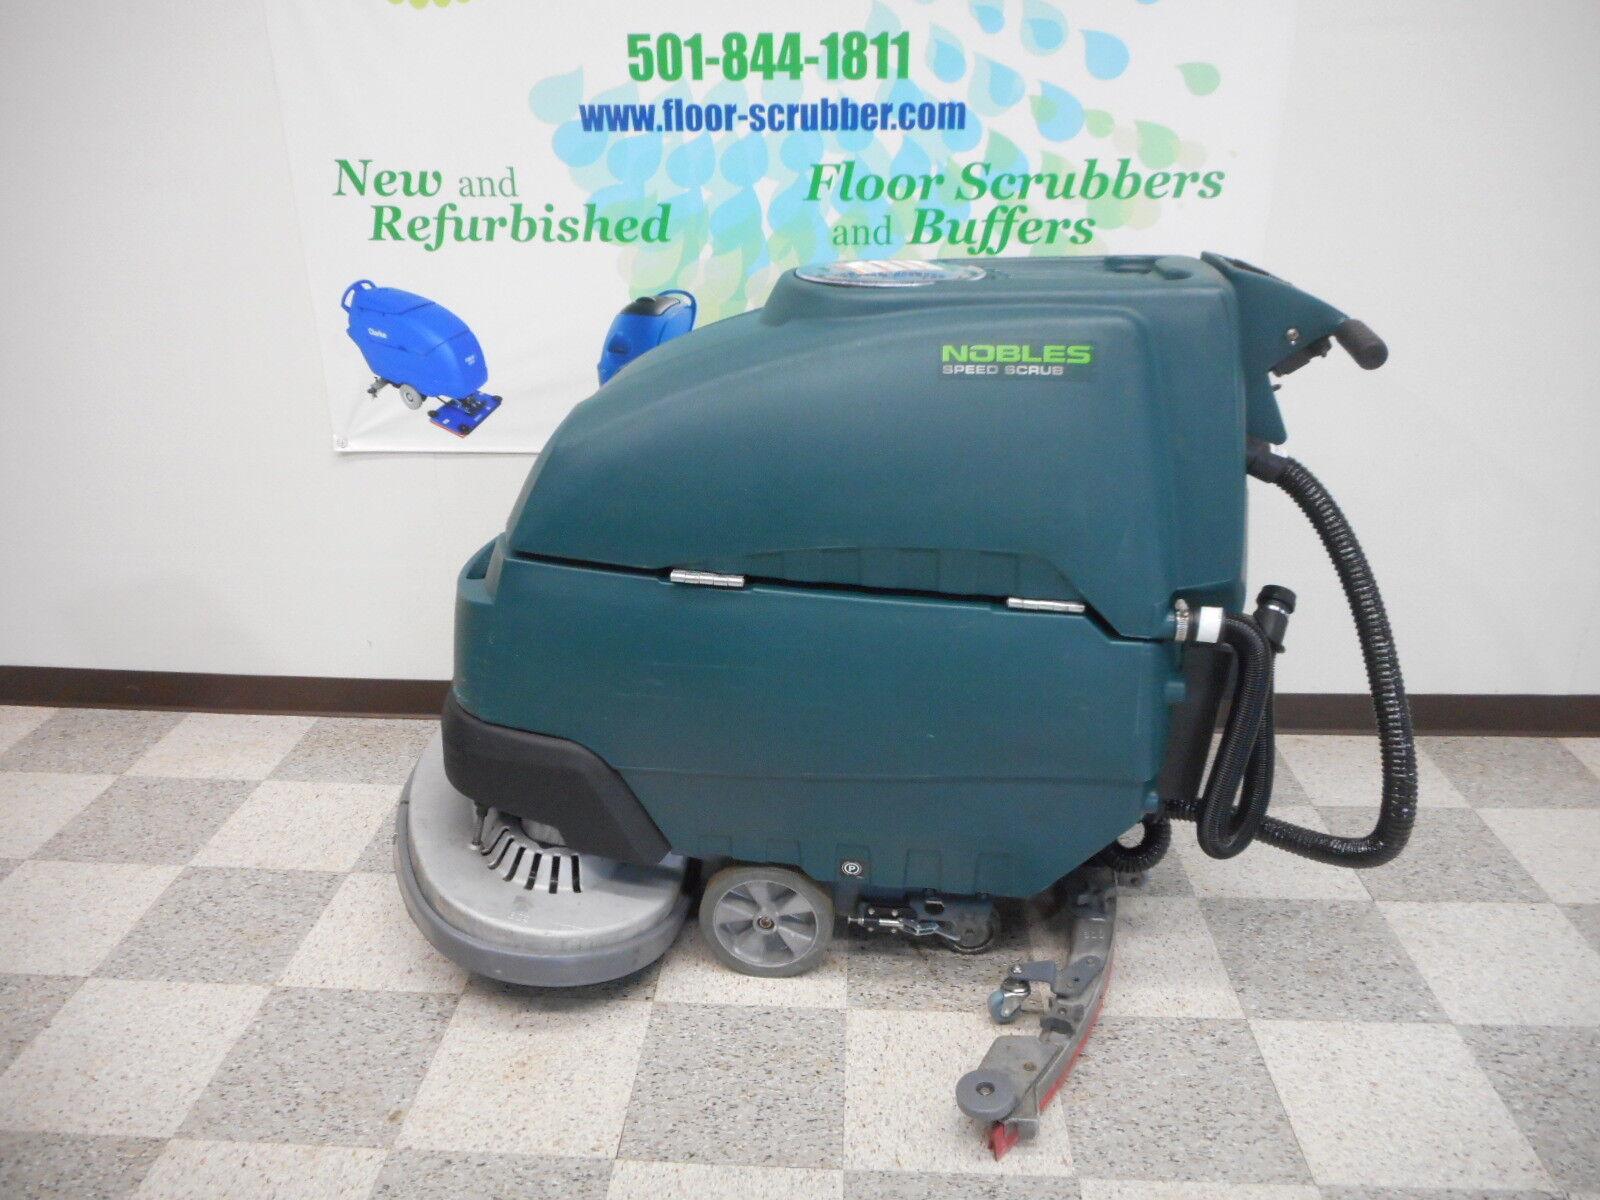 Nobles Ss Speed Scrub Floor Scrubber EBay - Floor scrubers